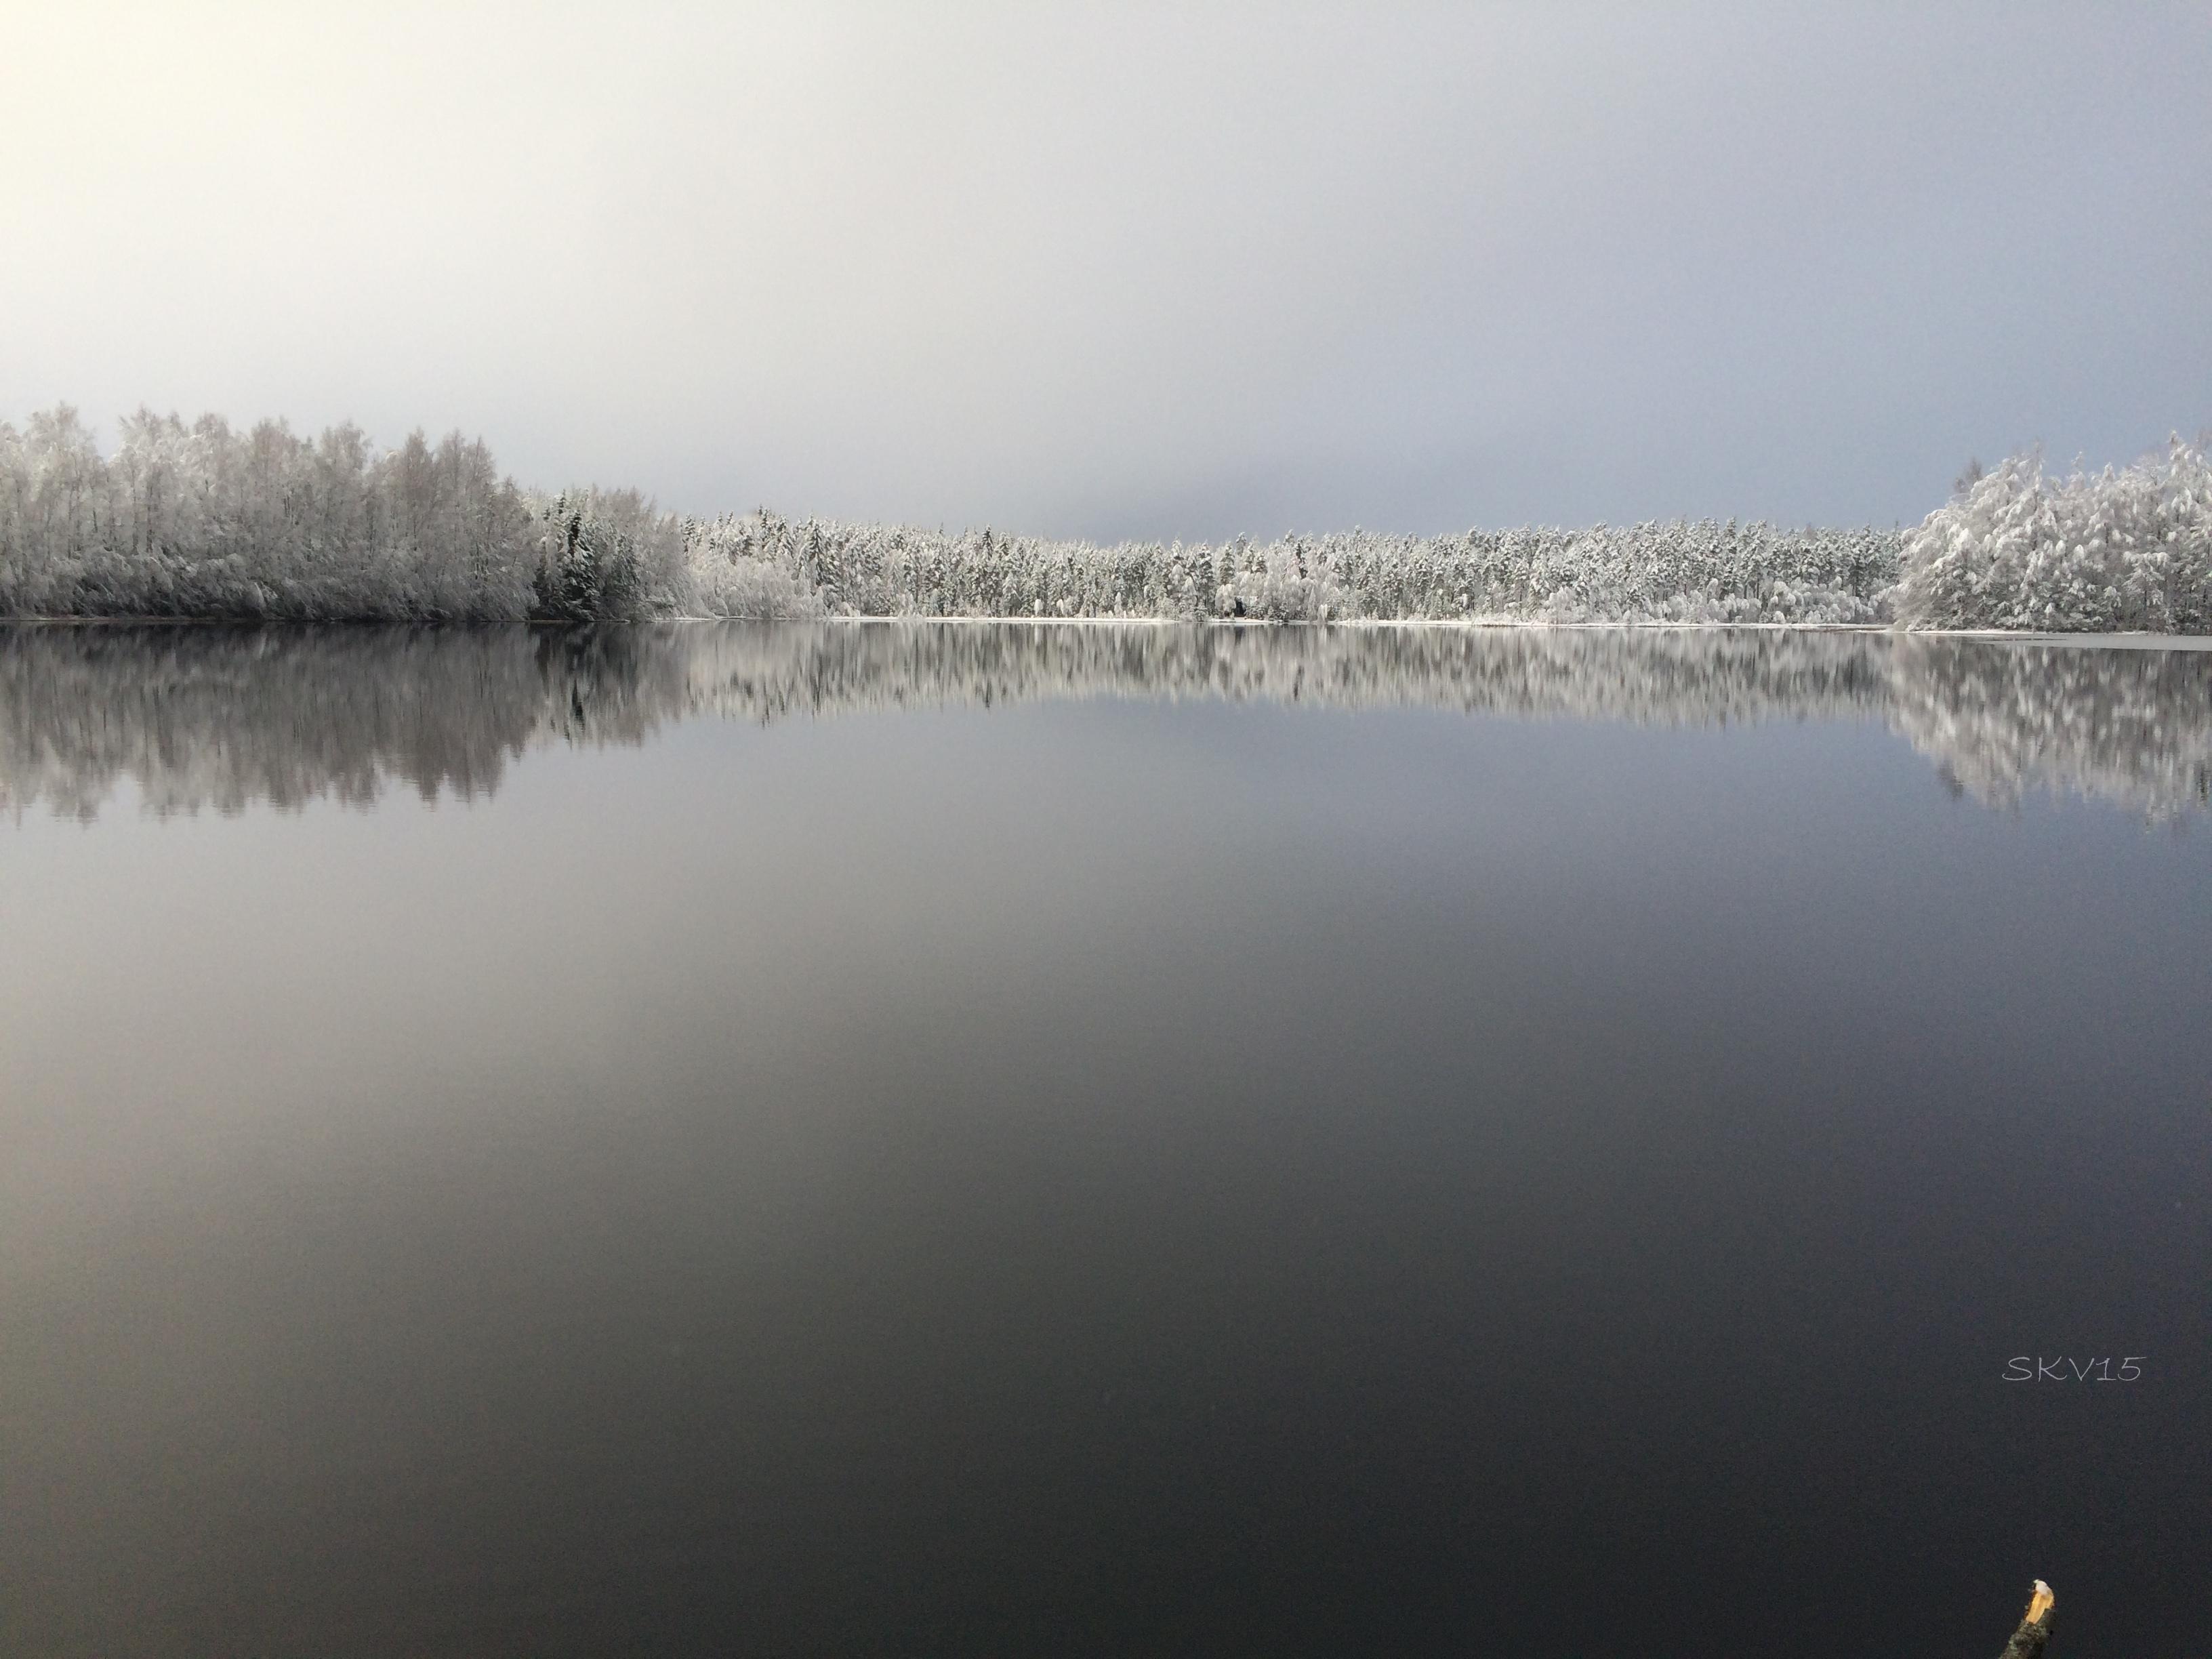 Lautaporras: Pitkäjärvi, Tammela